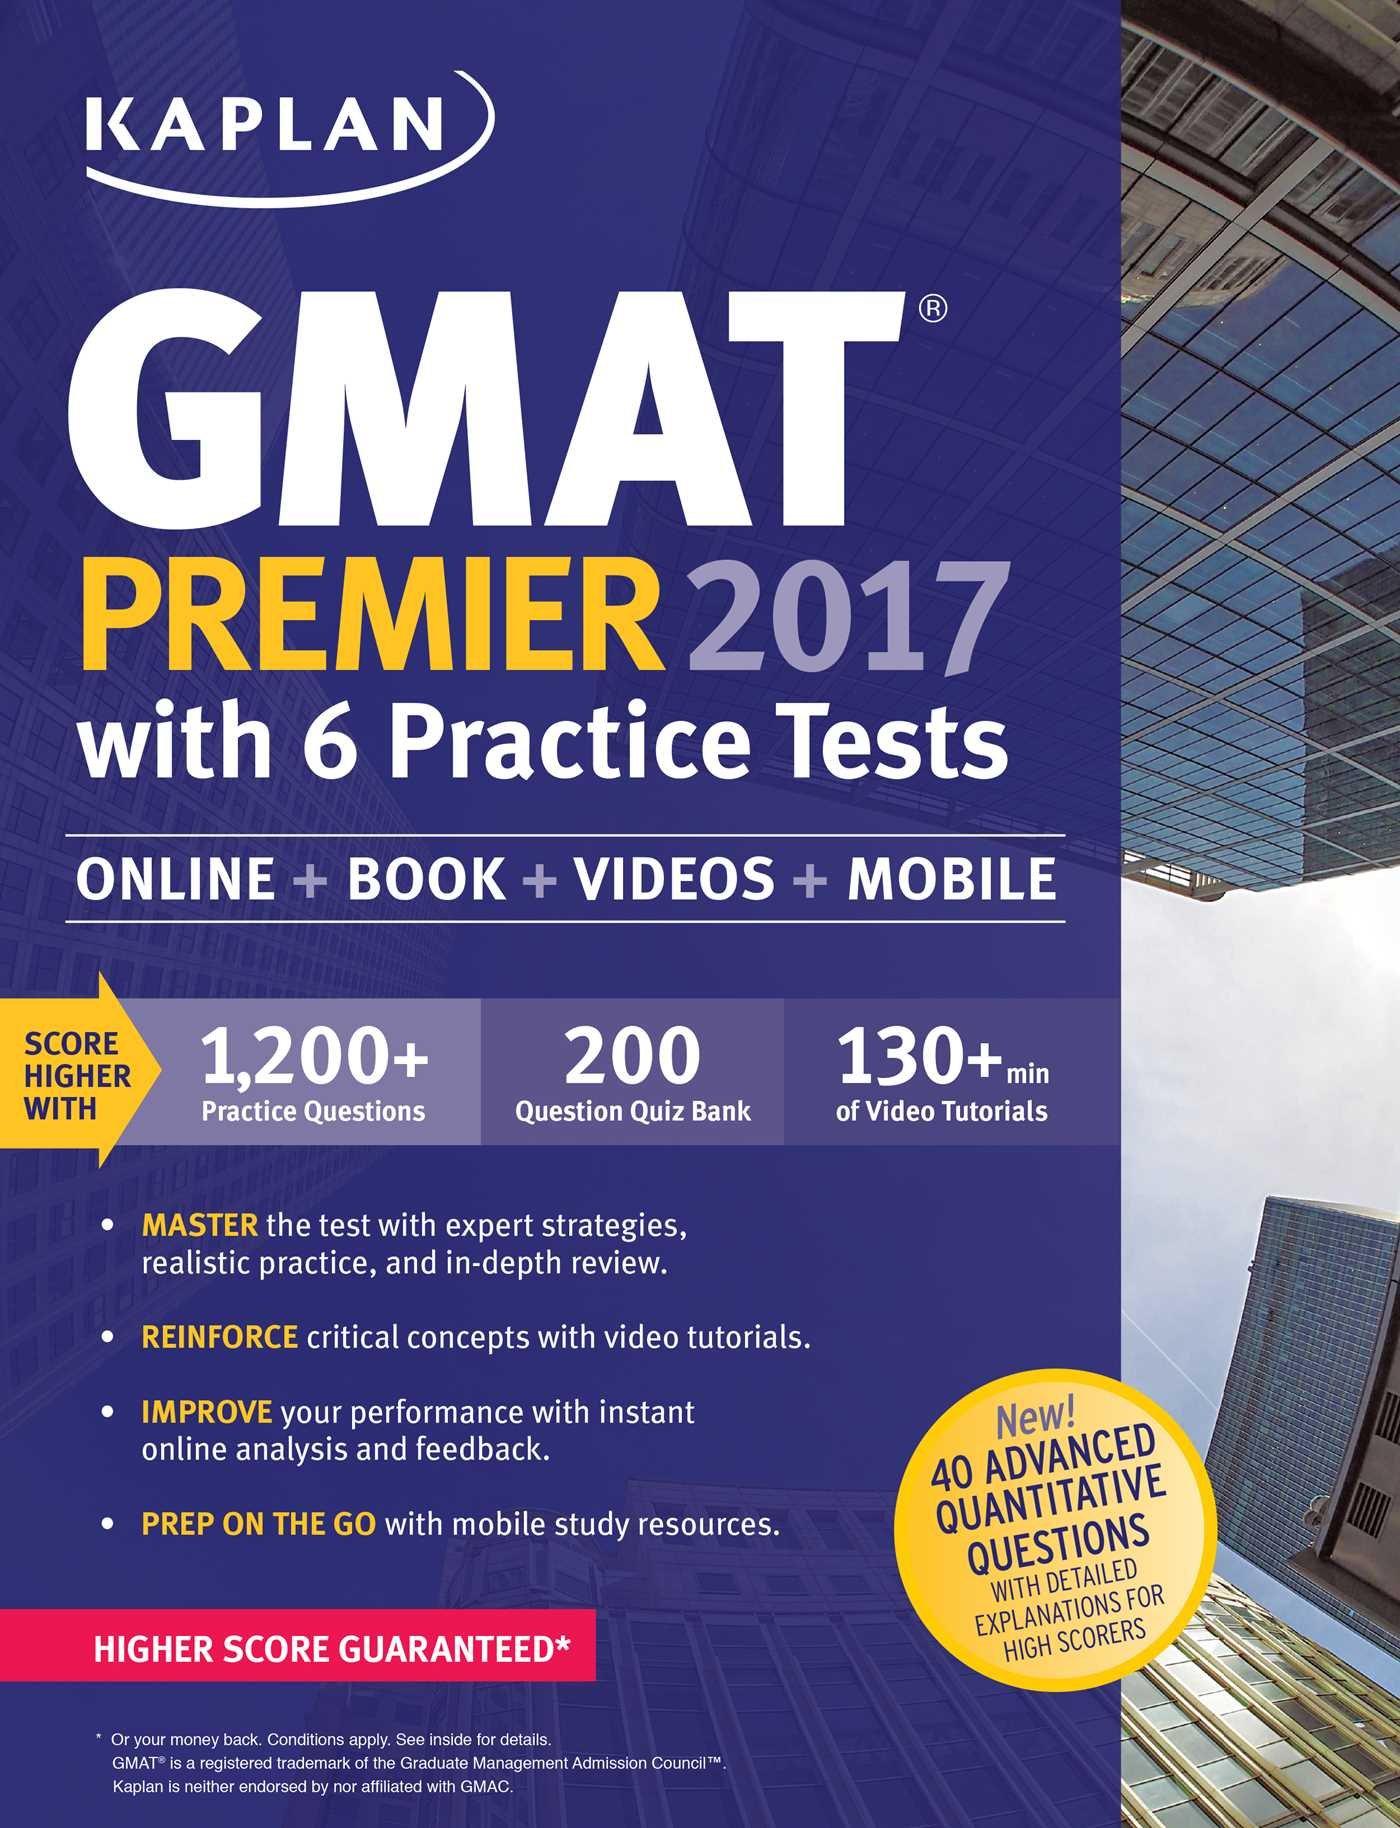 books essay writing gmat 91 121 113 106 best books for gmat exam preparation byju s gmat prep books essay writing gmat